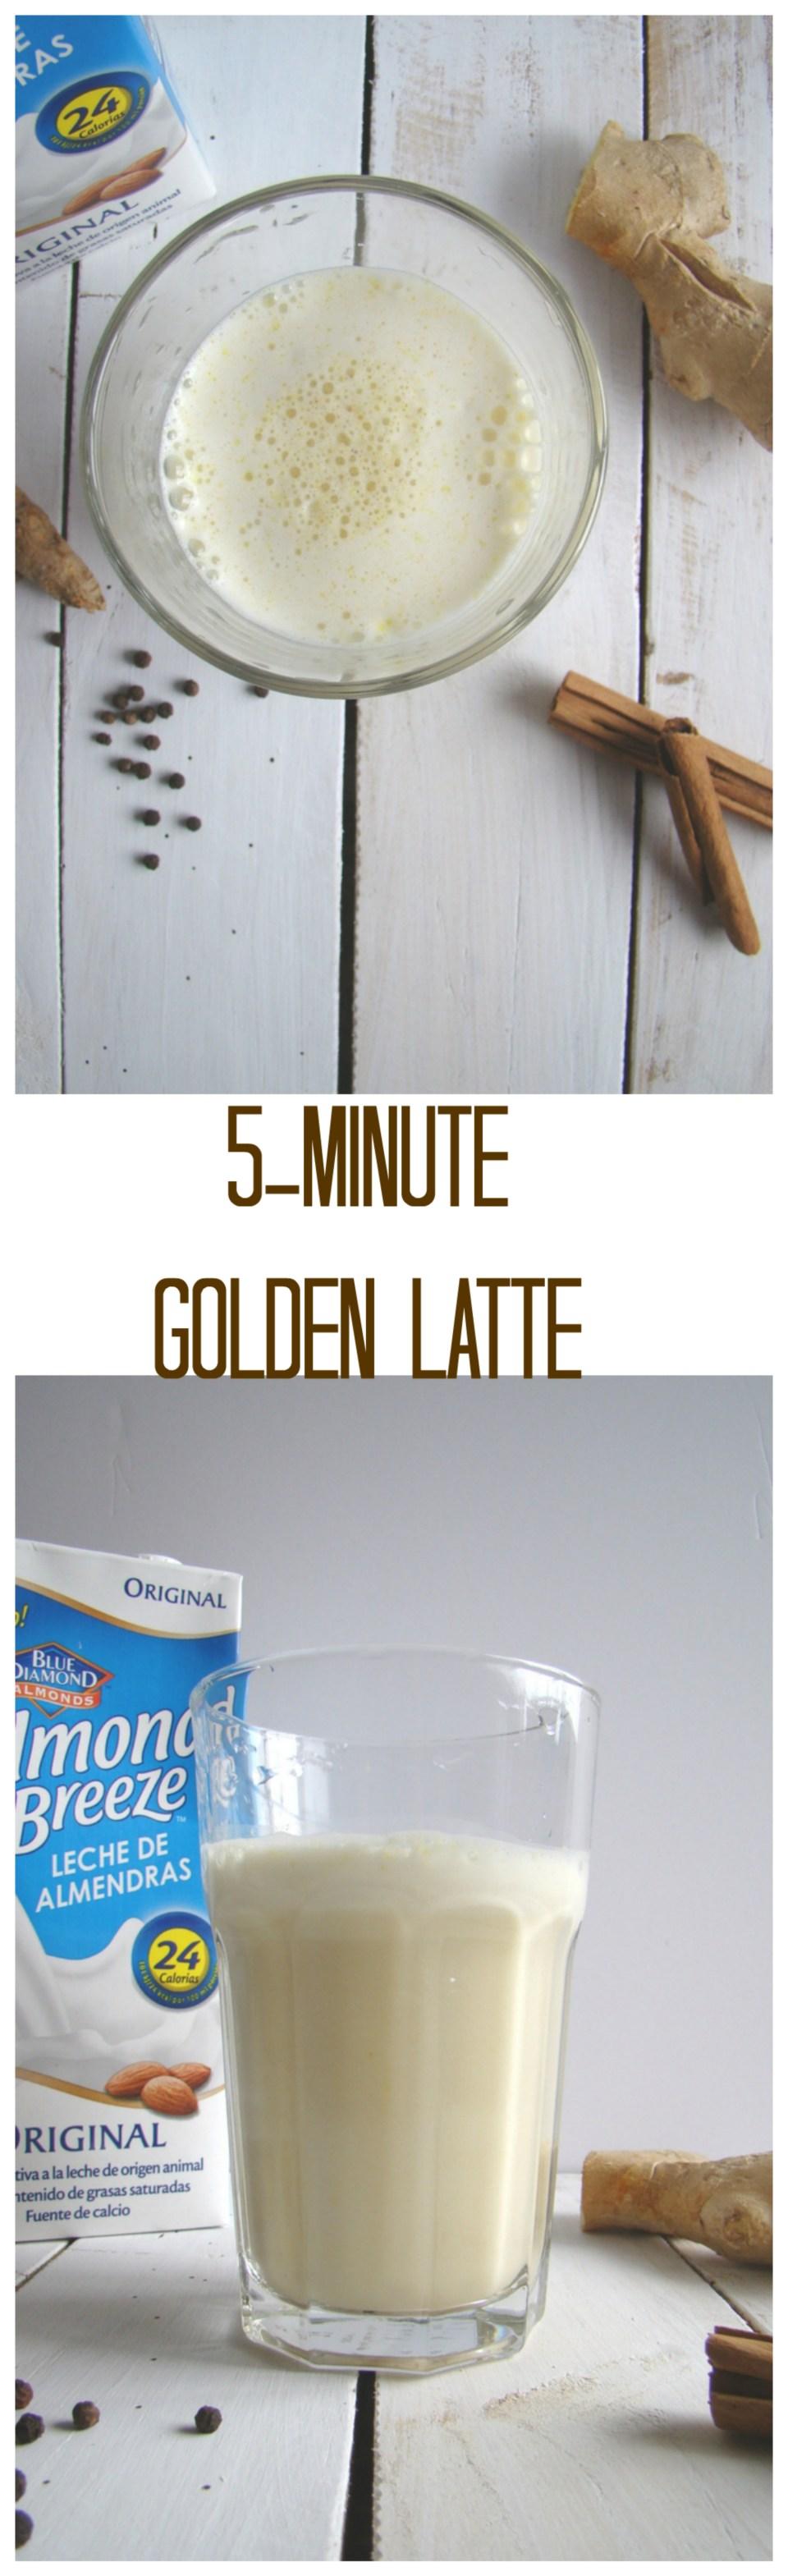 5-minute Golden Latte